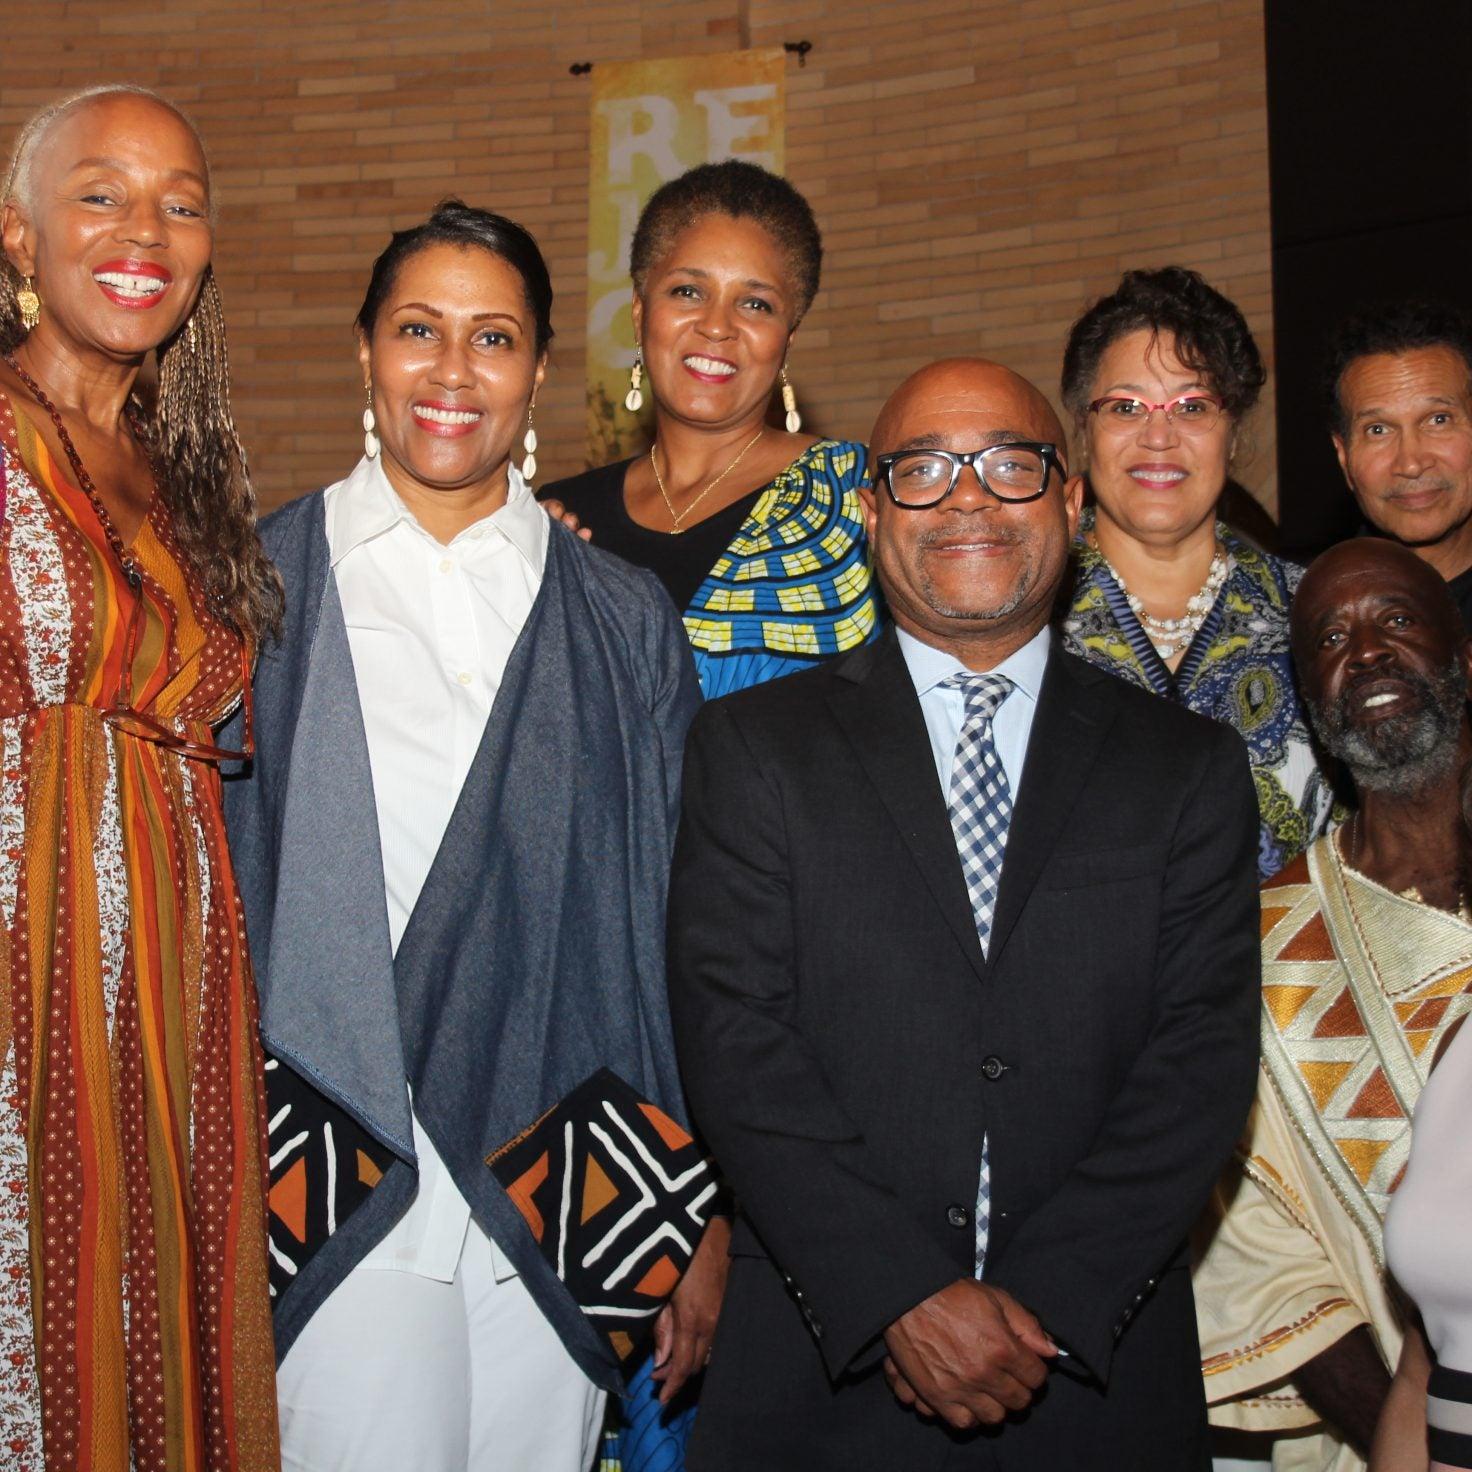 Commemorating 400 years Of Black History In Hampton, Virginia